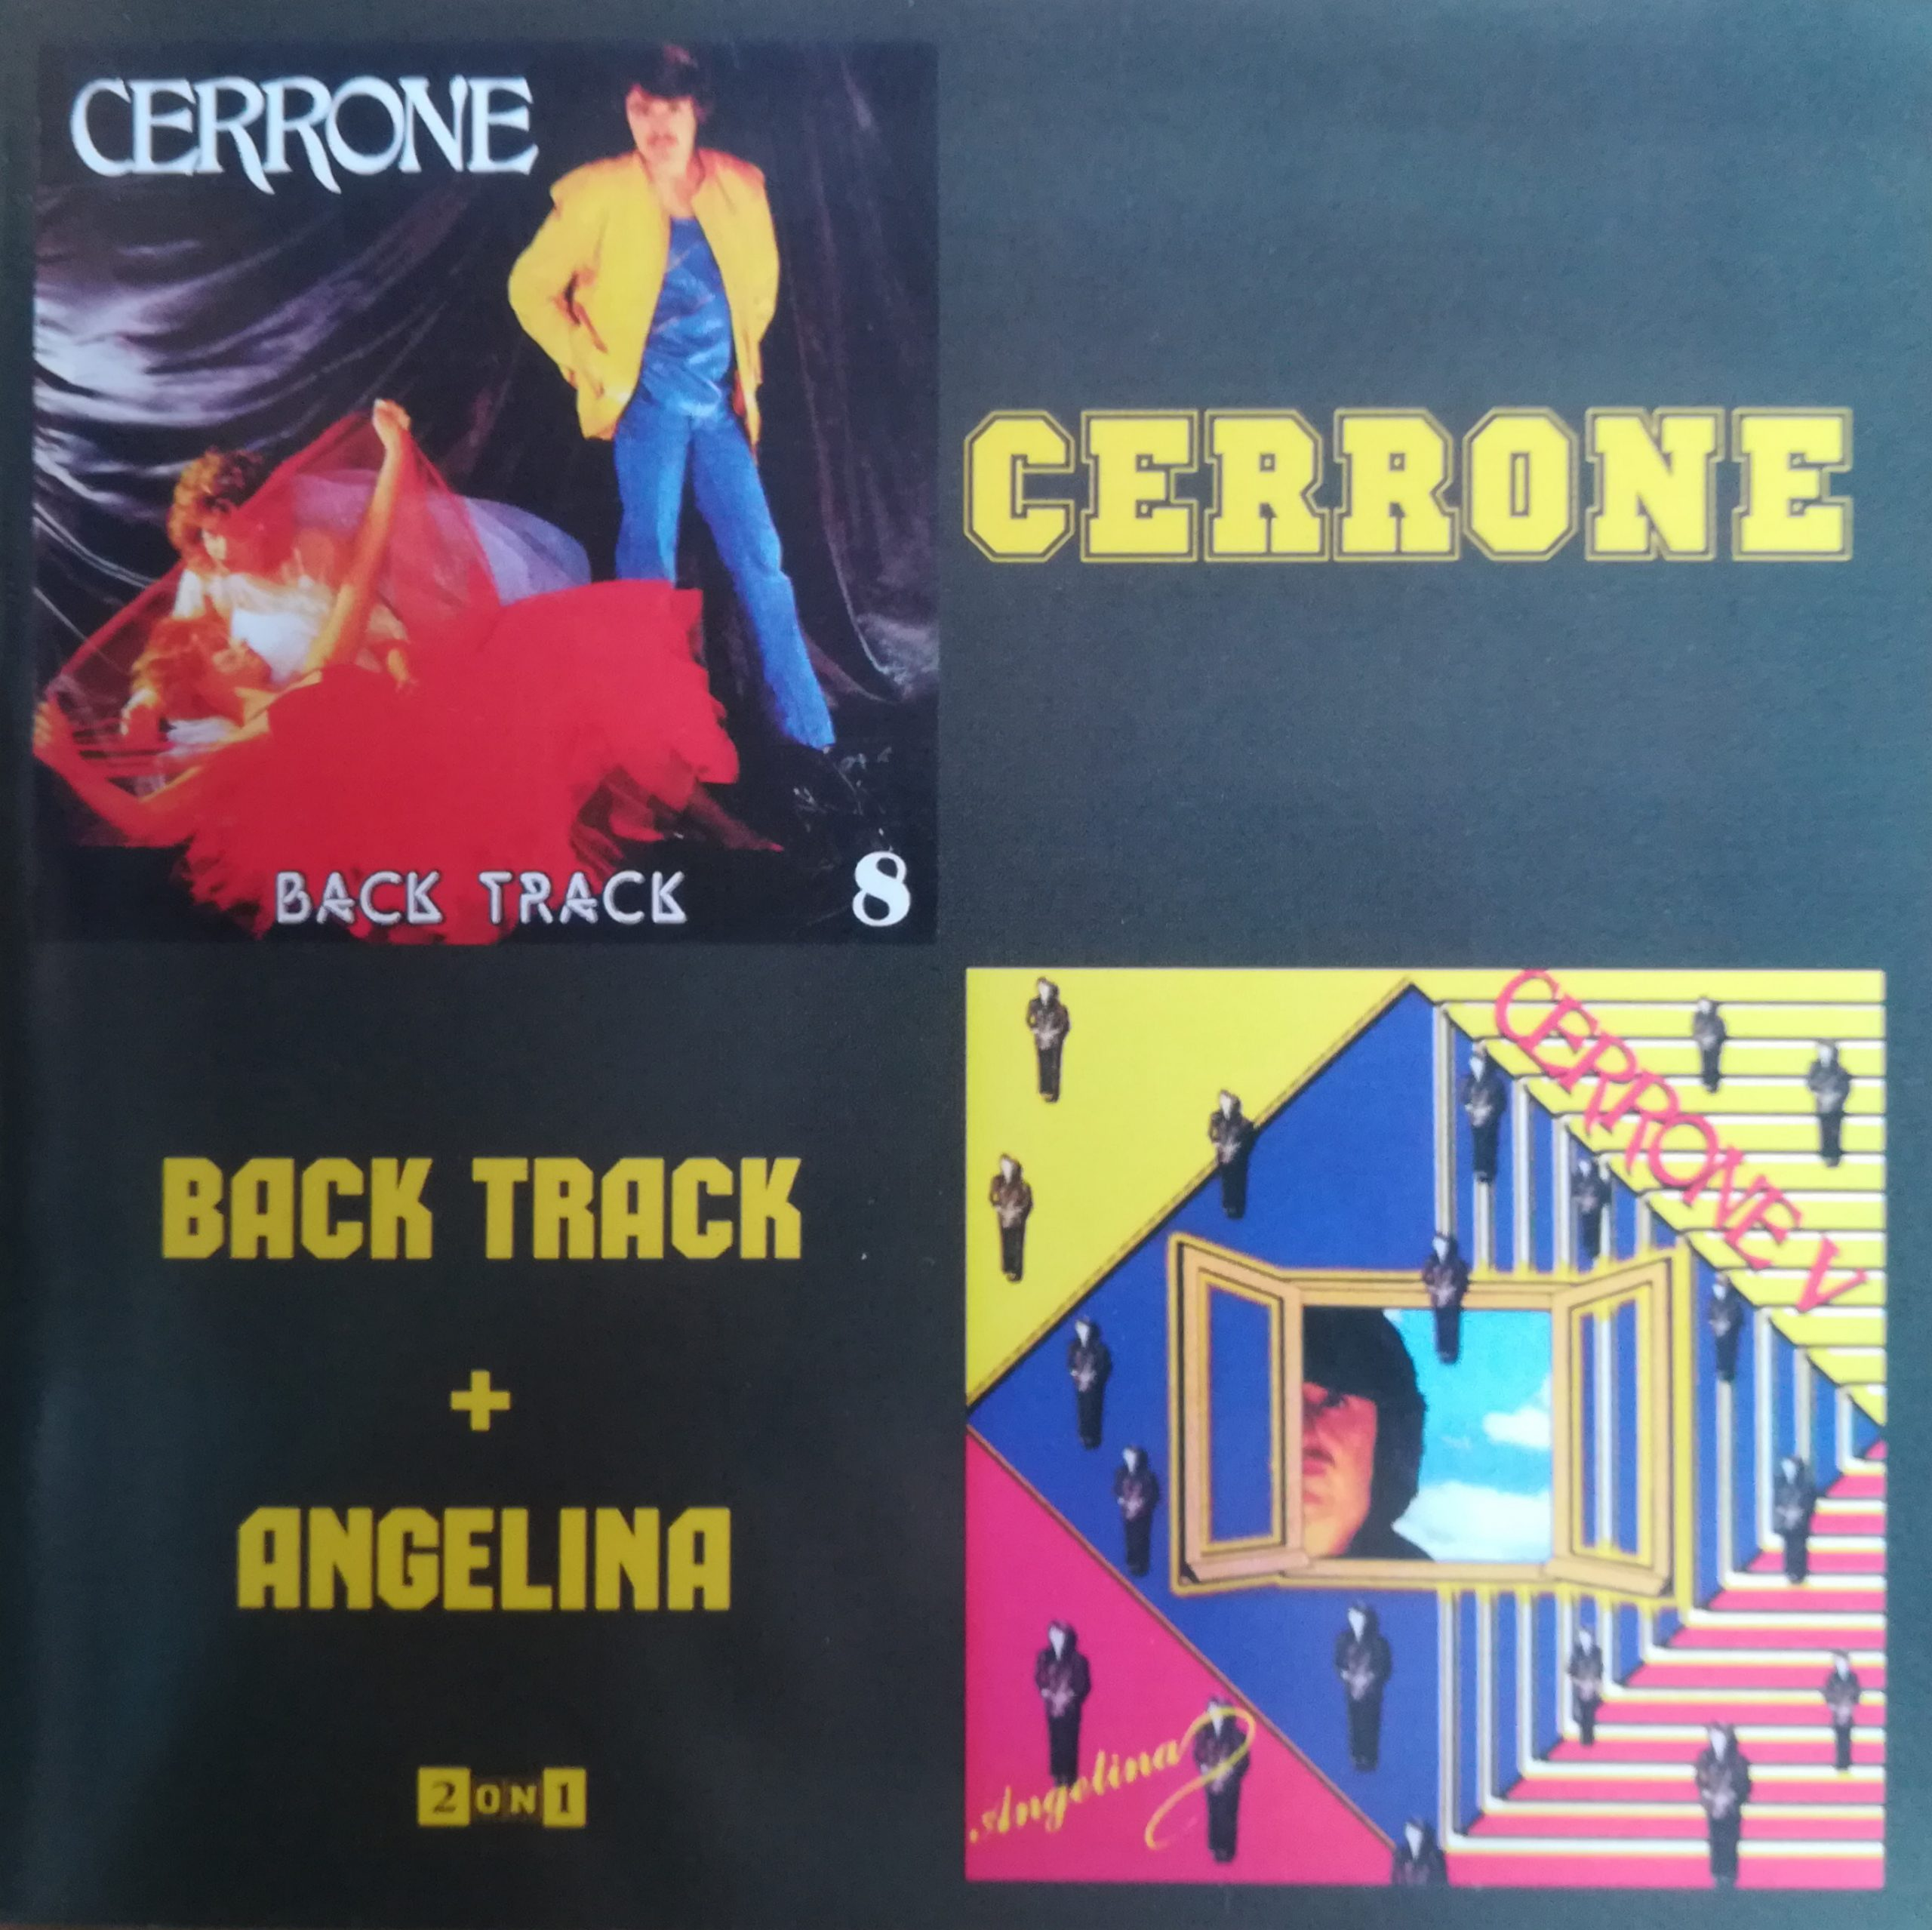 Cerrone - Back Track & Angelina (1982/1979)